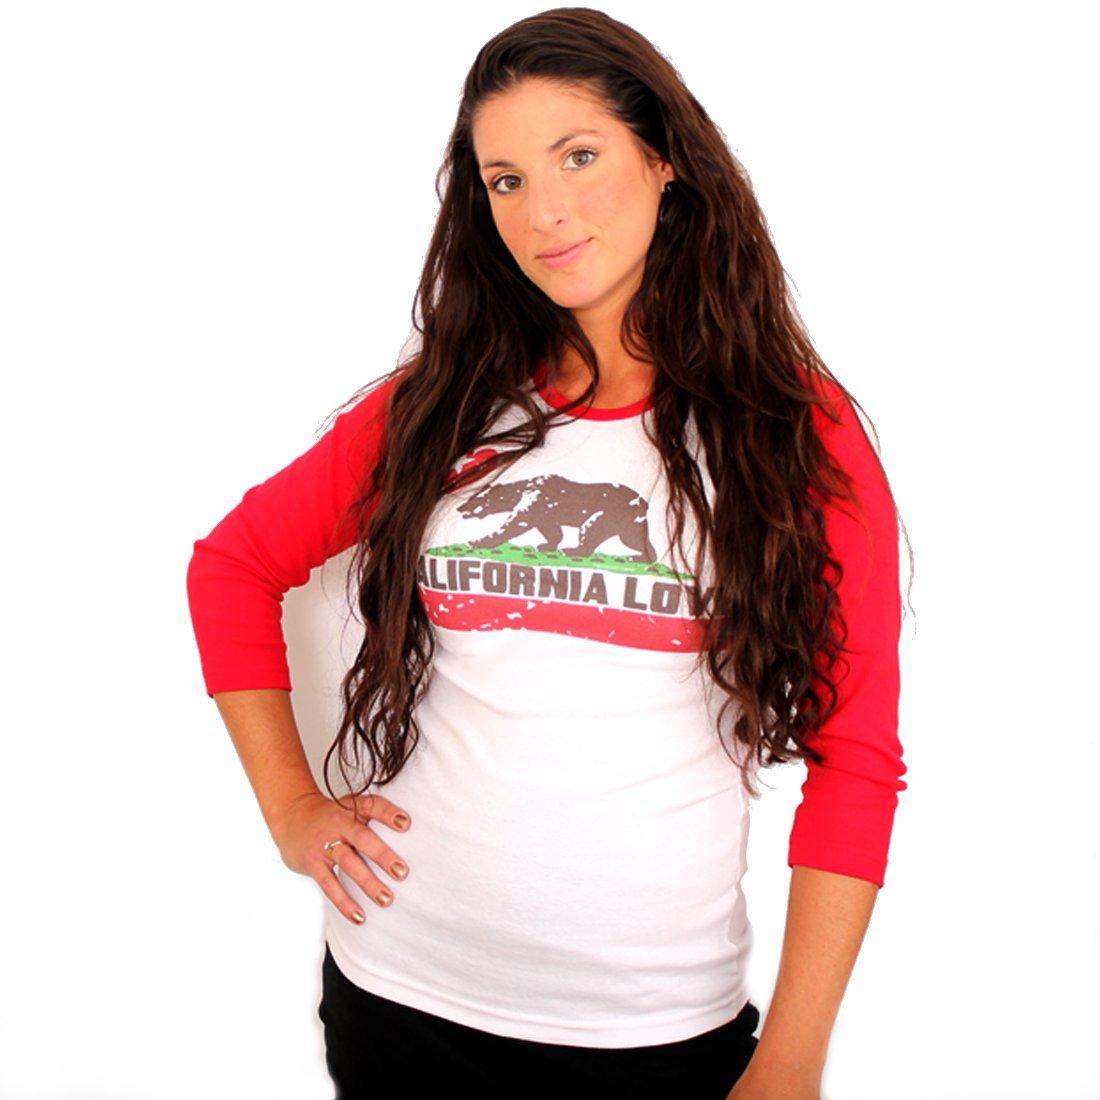 California Love Baseball Raglan Jersey B00FN2NSI6 XL|レッド レッド XL